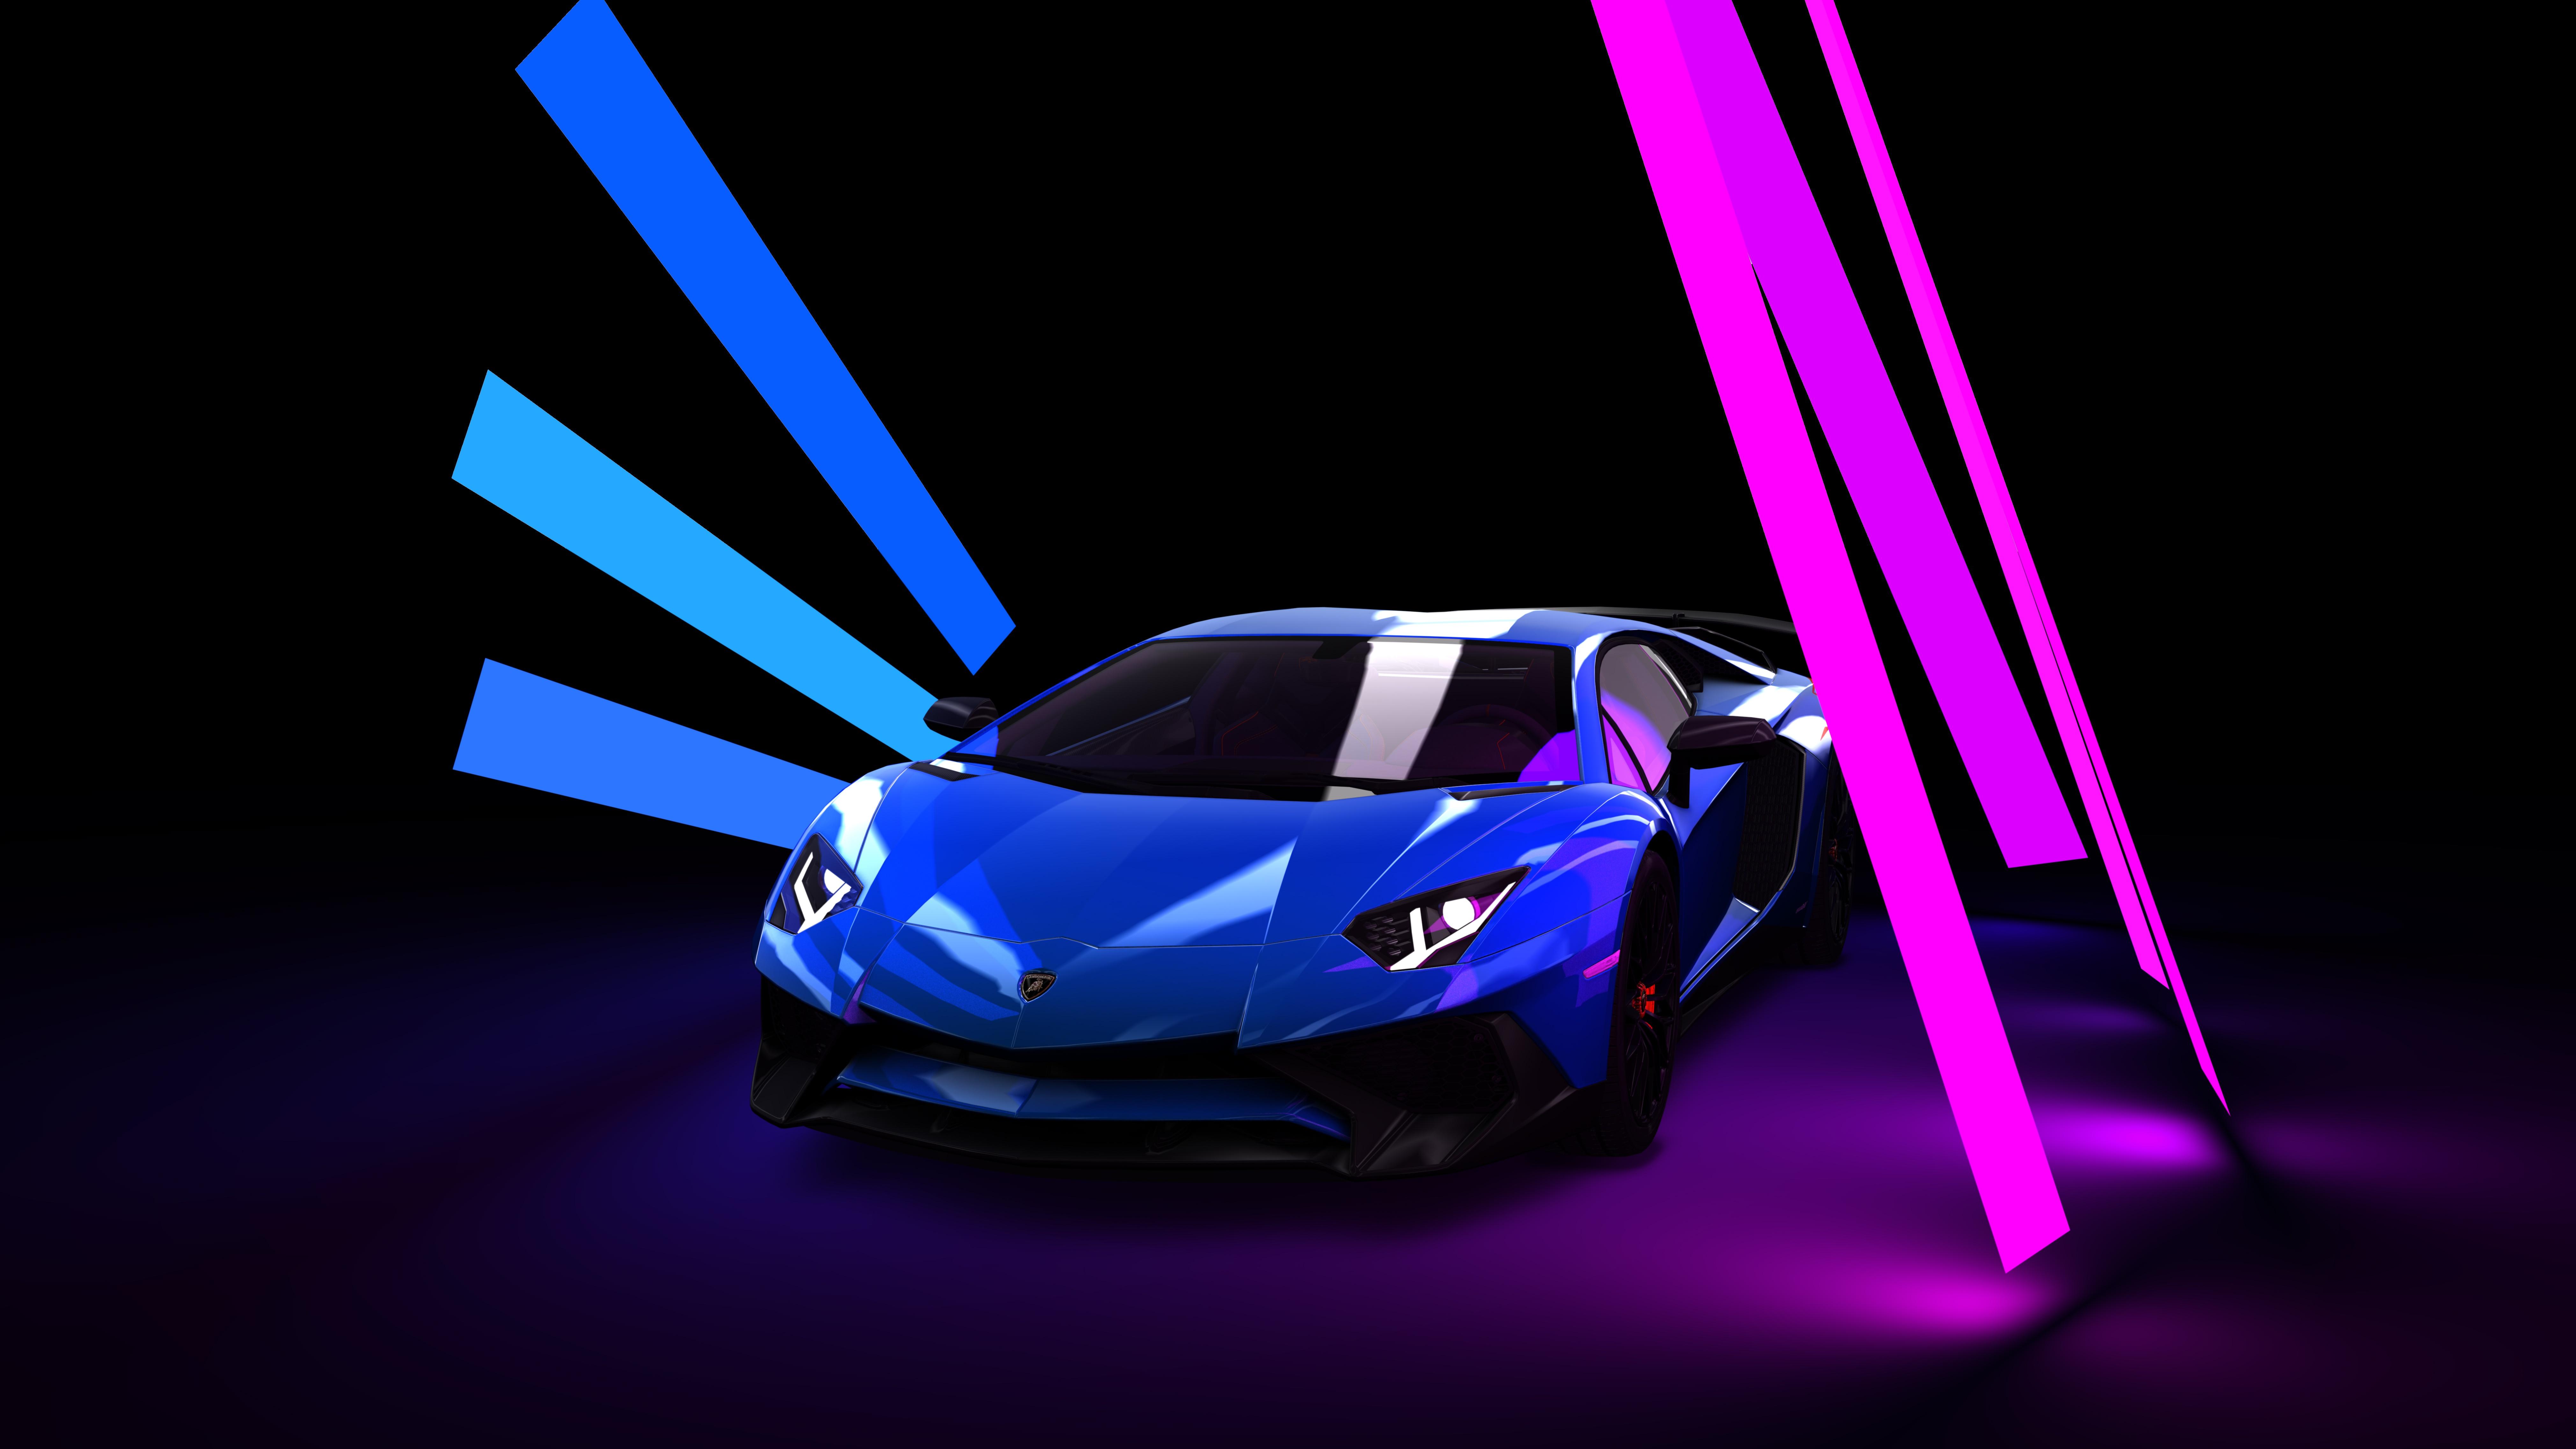 Lamborghini Aventador 4K 8K Wallpaper | HD Car Wallpapers ...